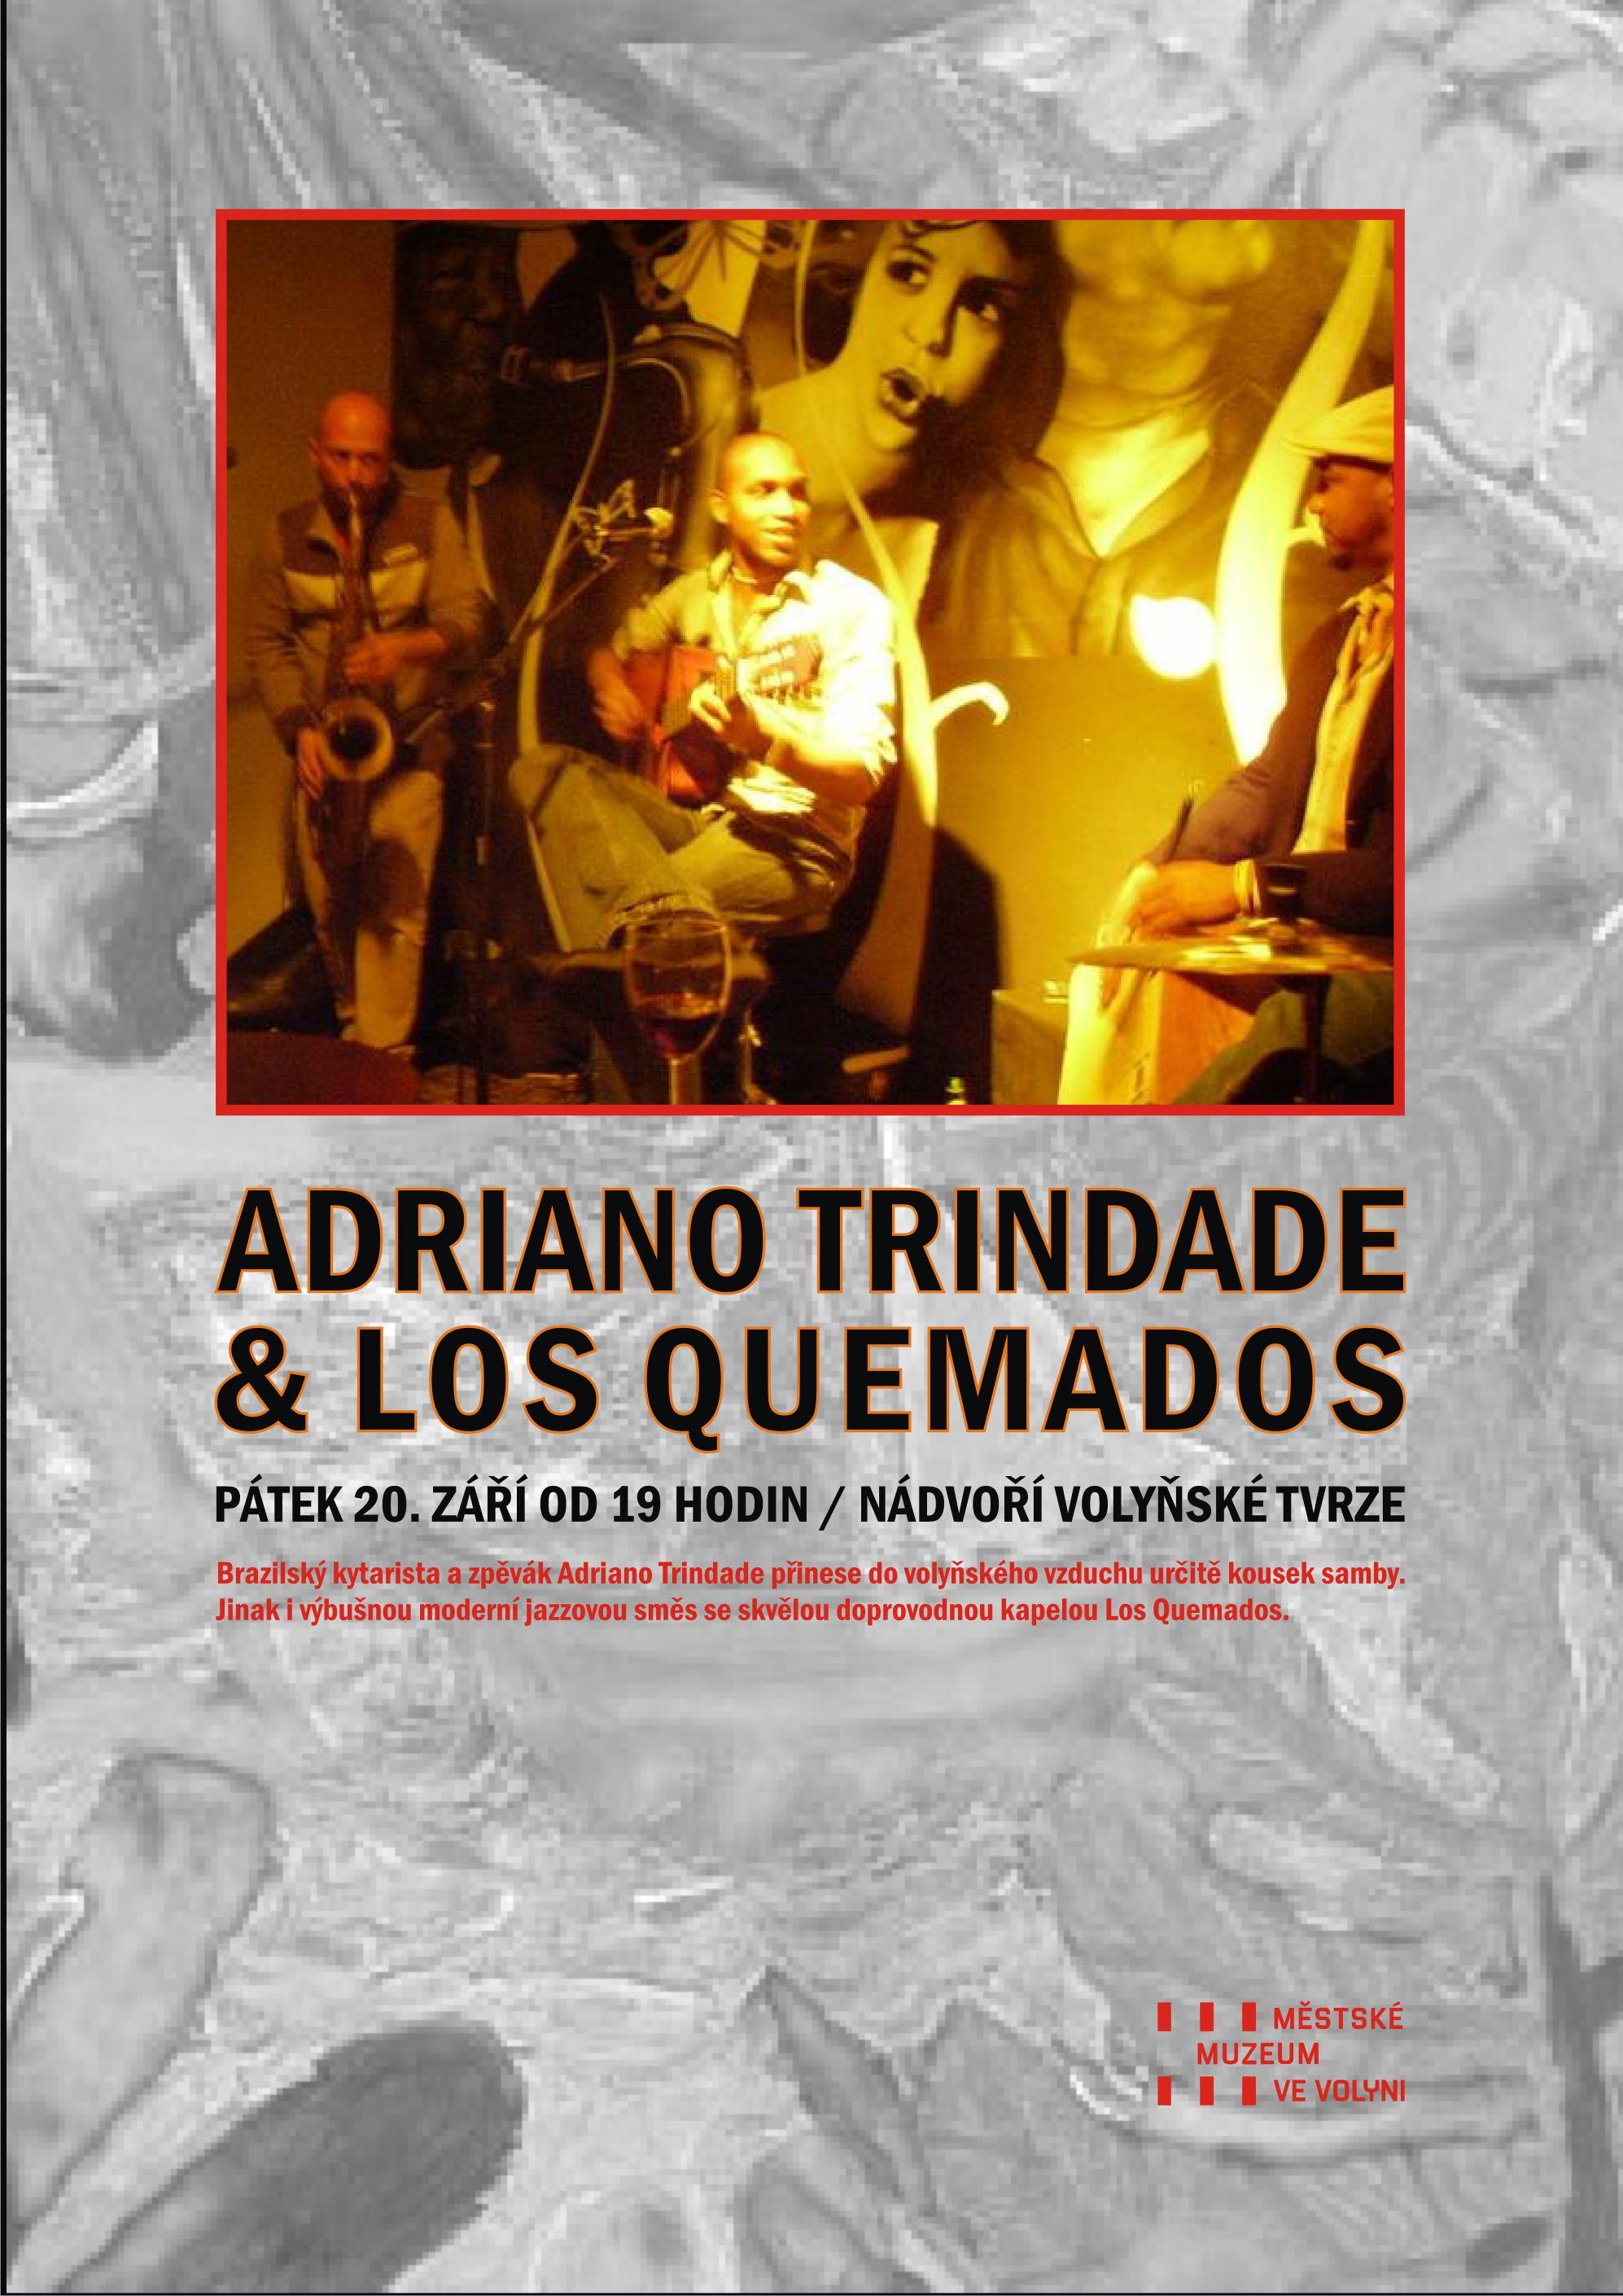 KONCERT - NÁDVOŘÍ TVRZE: ADRIANO TRINDADE & LOS QUEMADOS